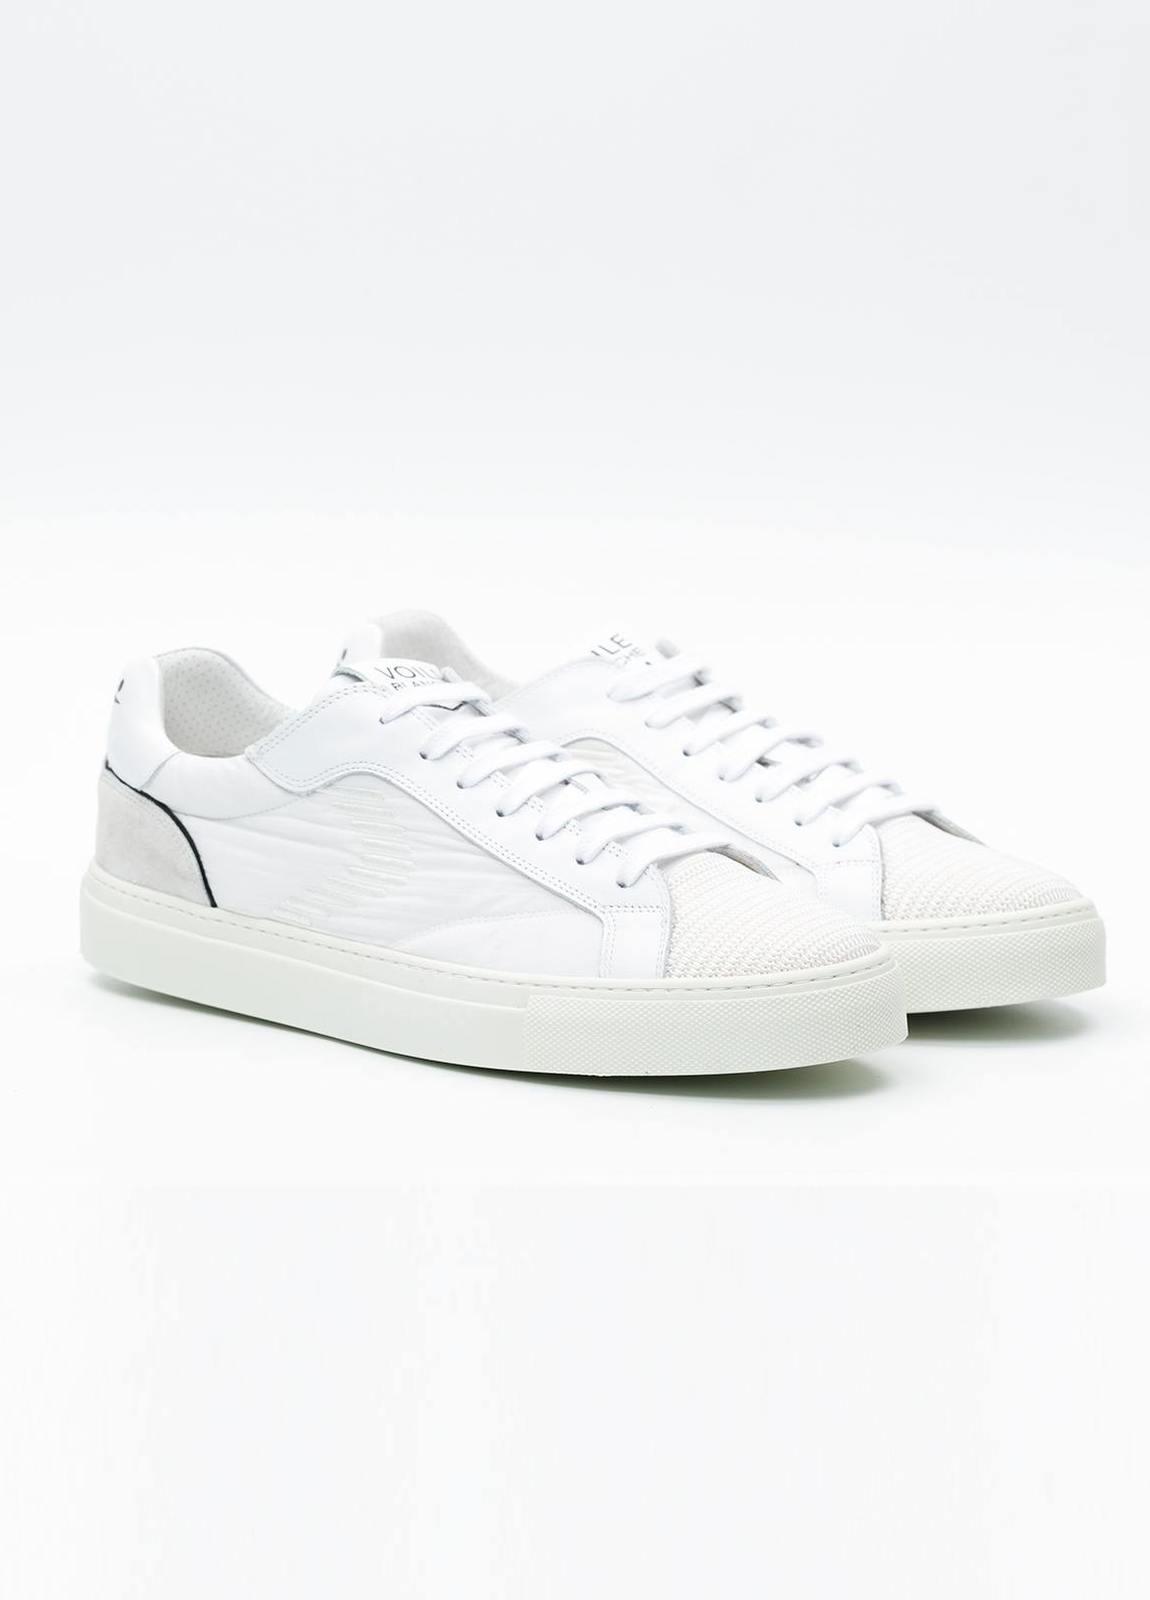 Bambas moda hombre modelo PORTOFINO color blanco, Serraje y tejido técnico. - Ítem3